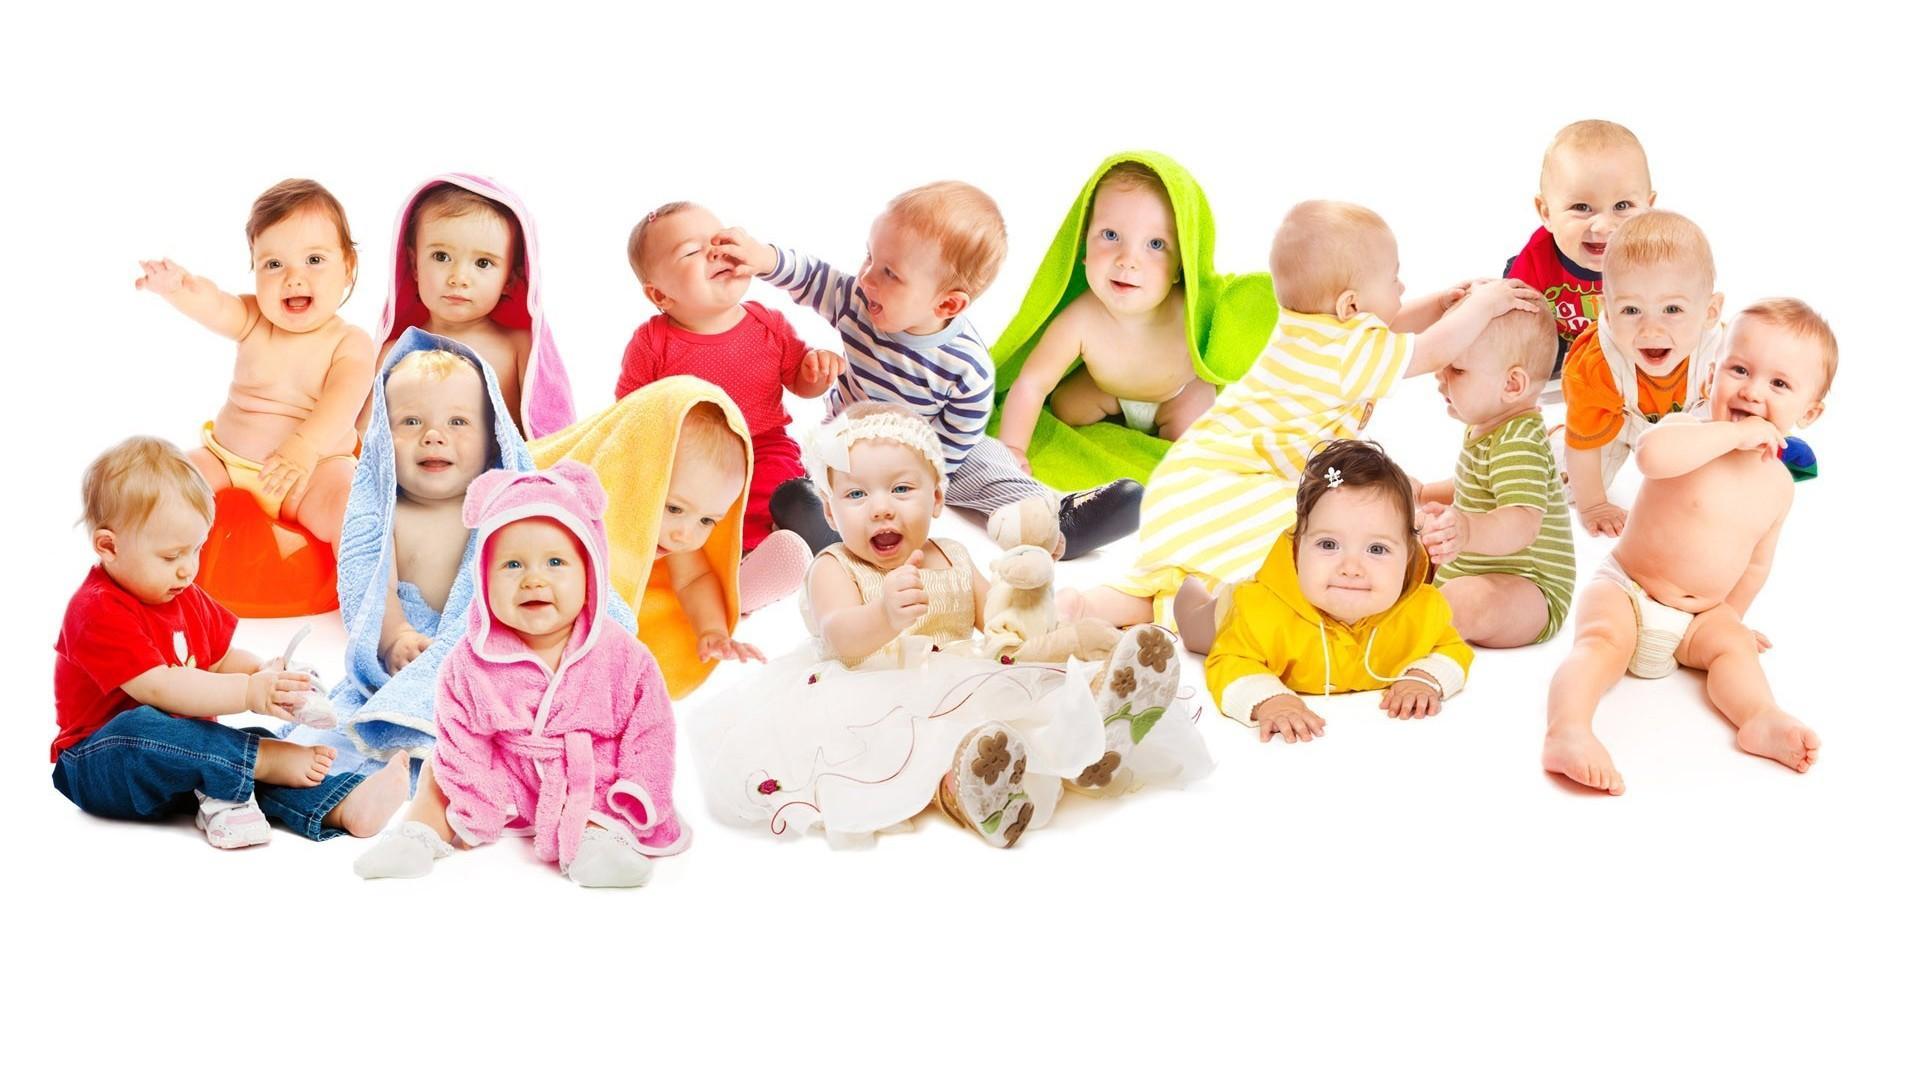 many_cute_kids.jpg (173.26 Kb)